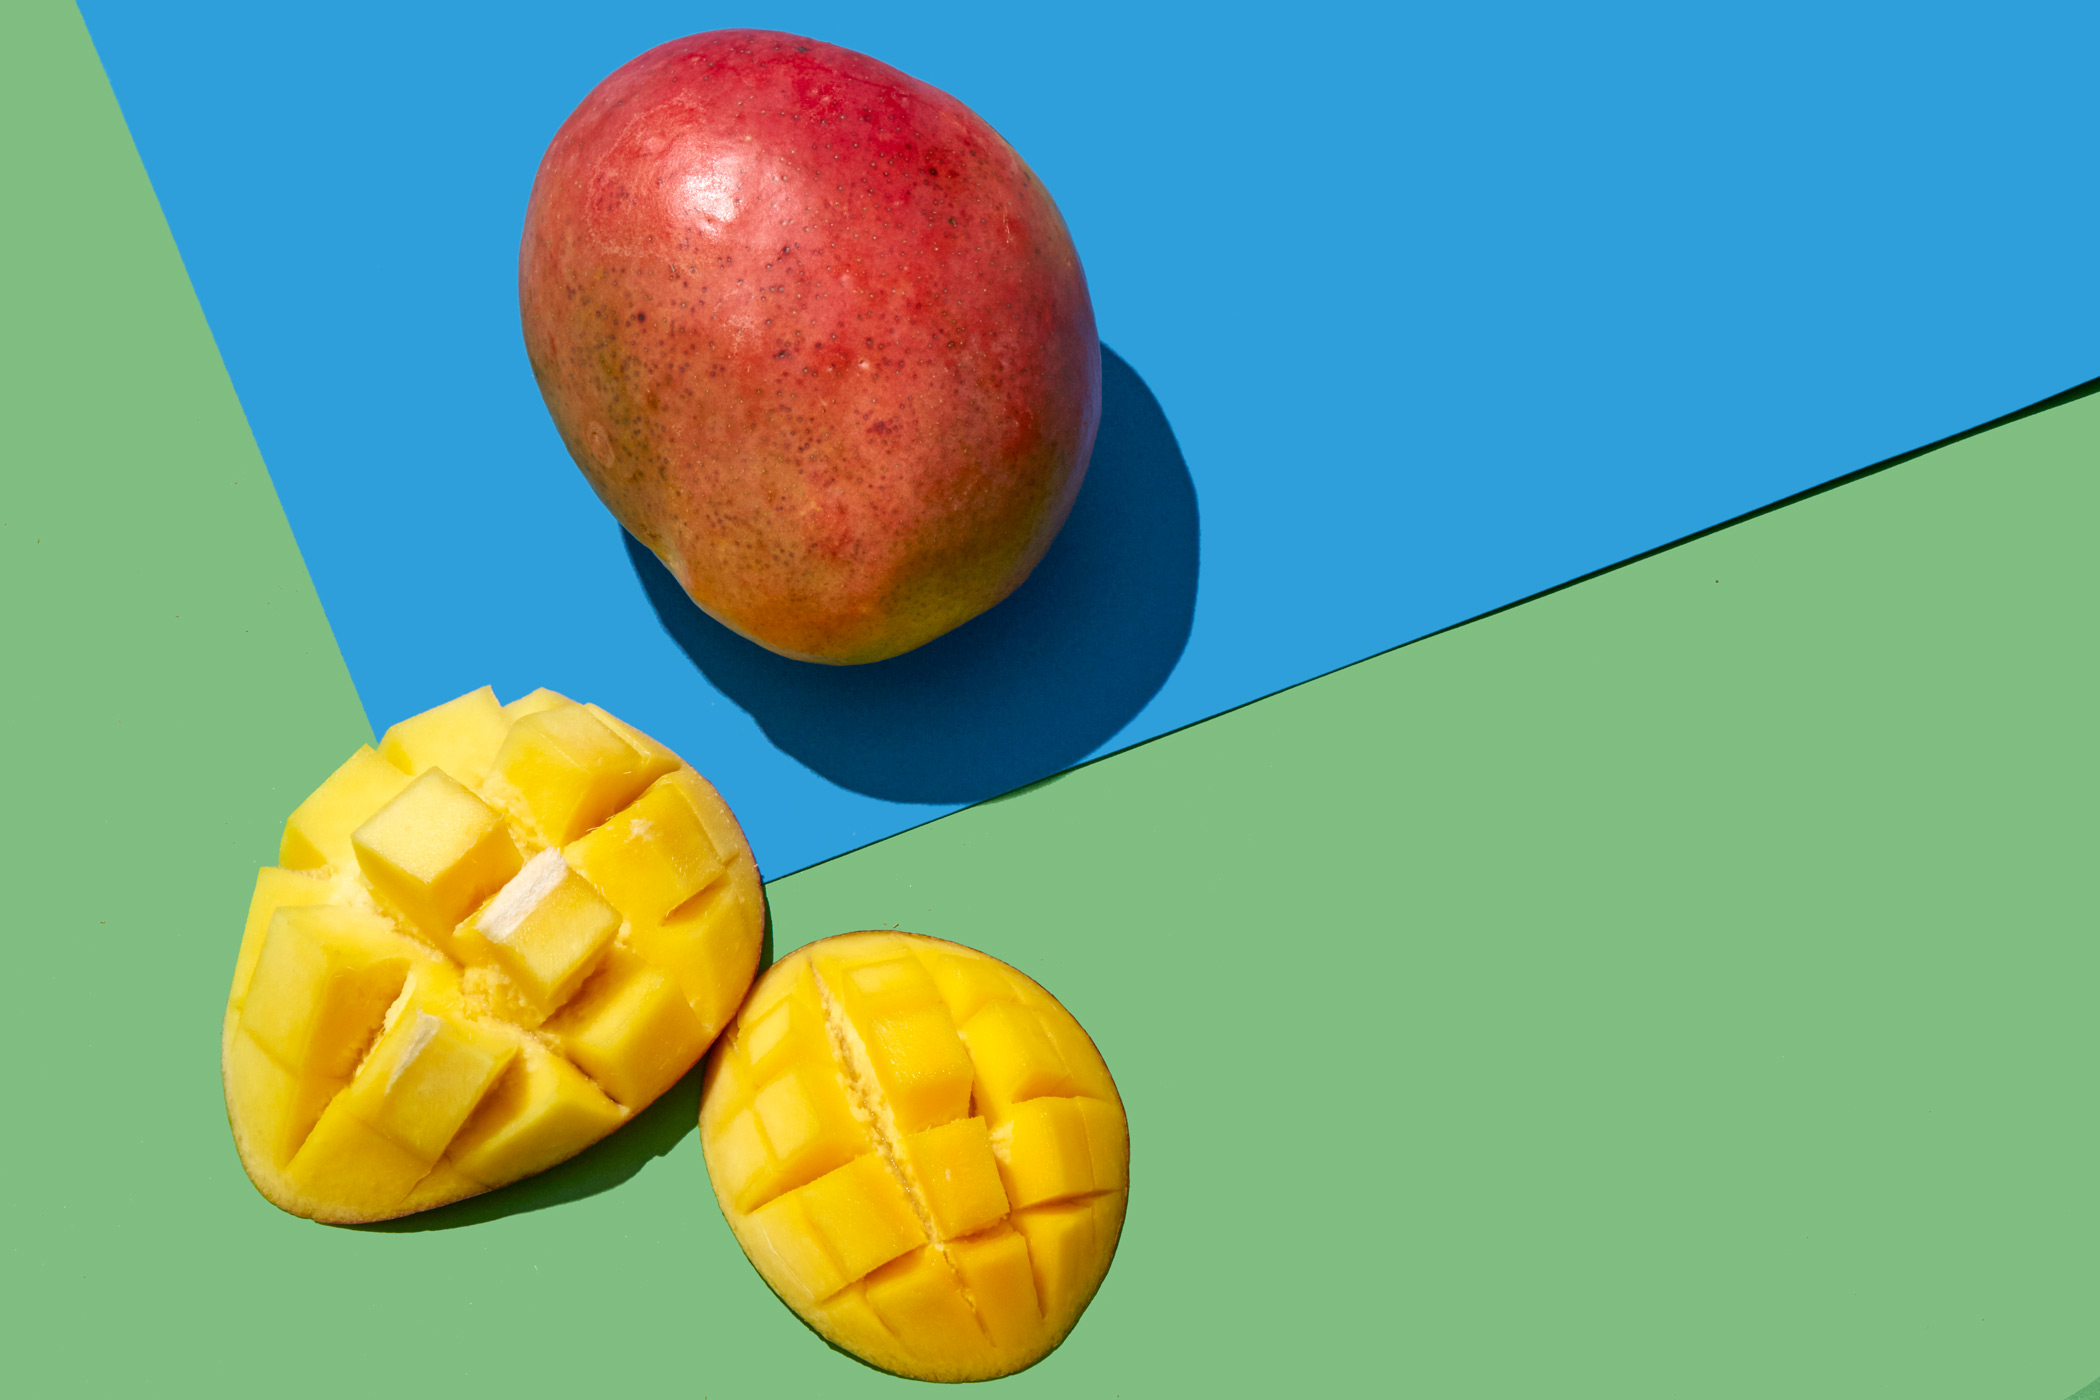 healthiest foods, health food, diet, nutrition, time.com stock, mango, fruit